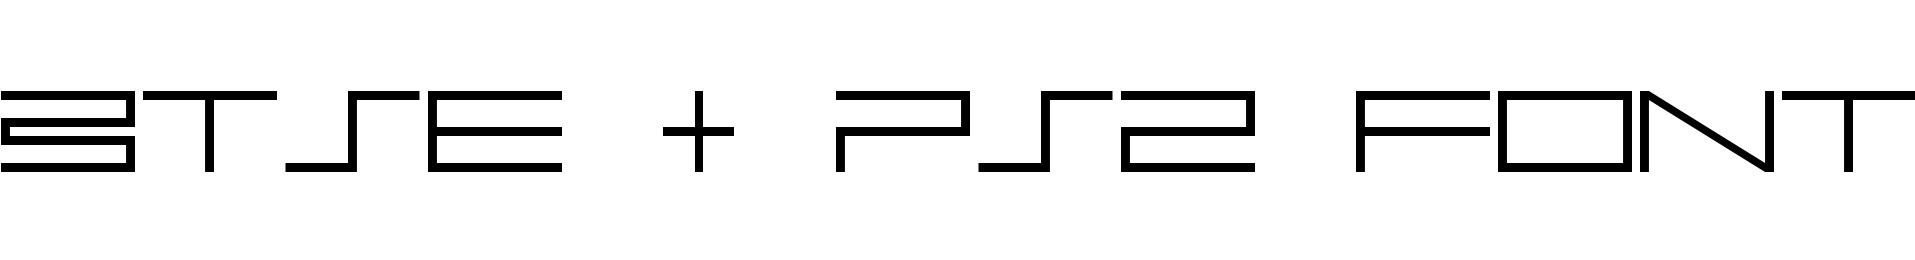 BTSE + PS2 FONT